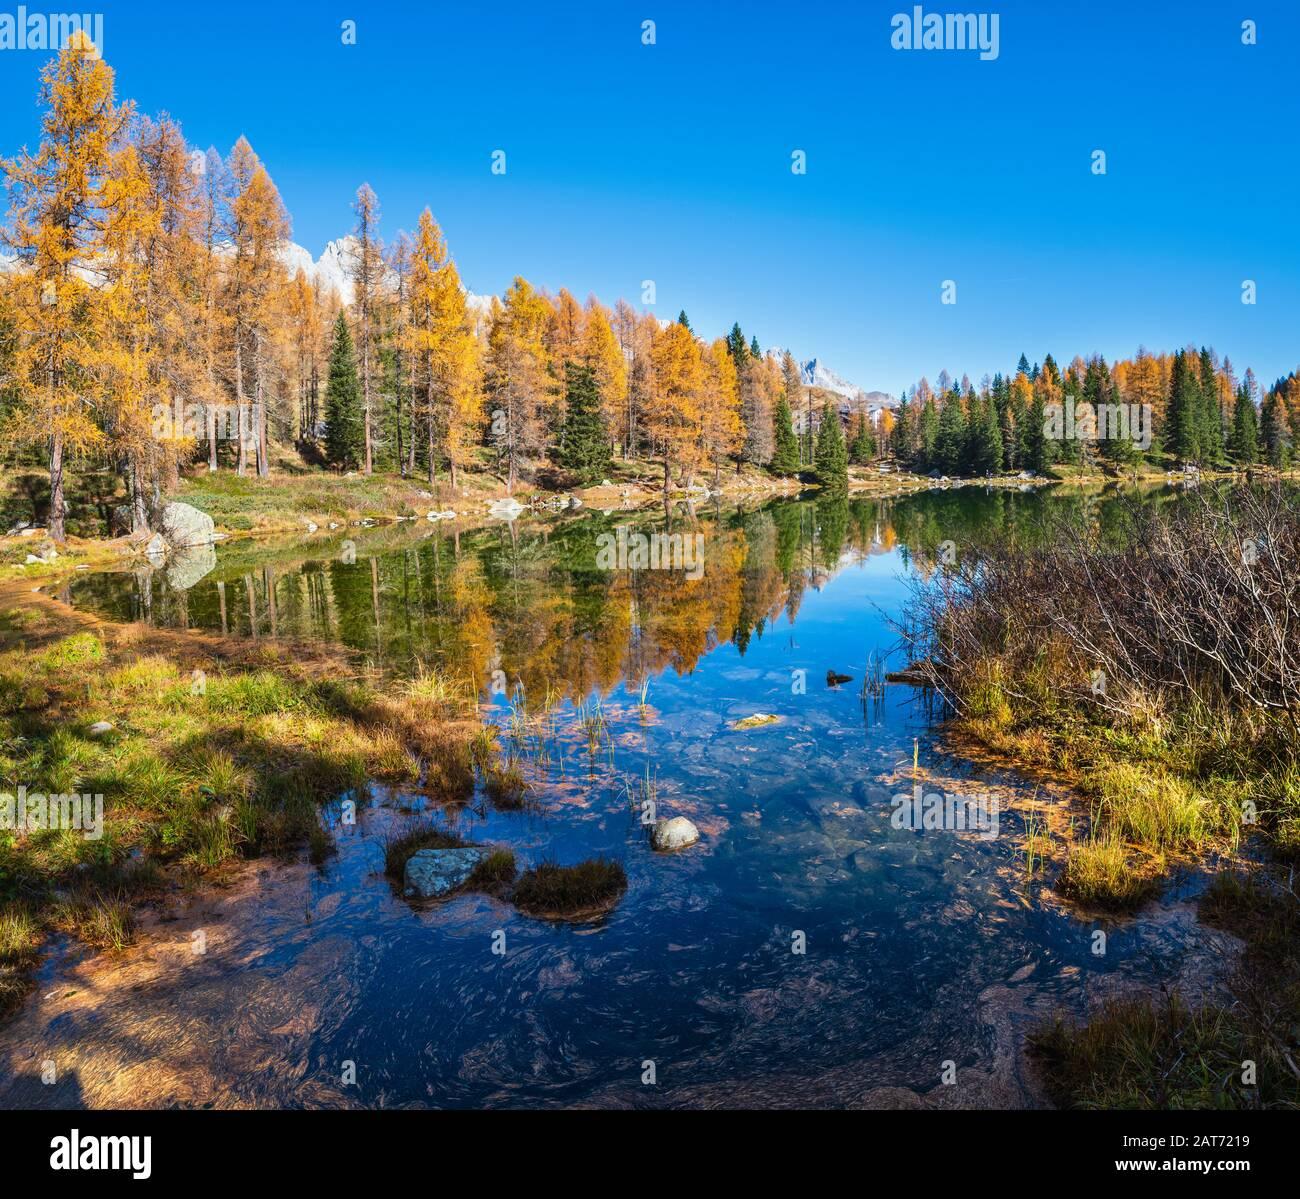 Autumn alpine mountain lake near San Pellegrino Pass, Trentino, Dolomites Alps, Italy. Picturesque traveling, seasonal and nature beauty concept scene Stock Photo